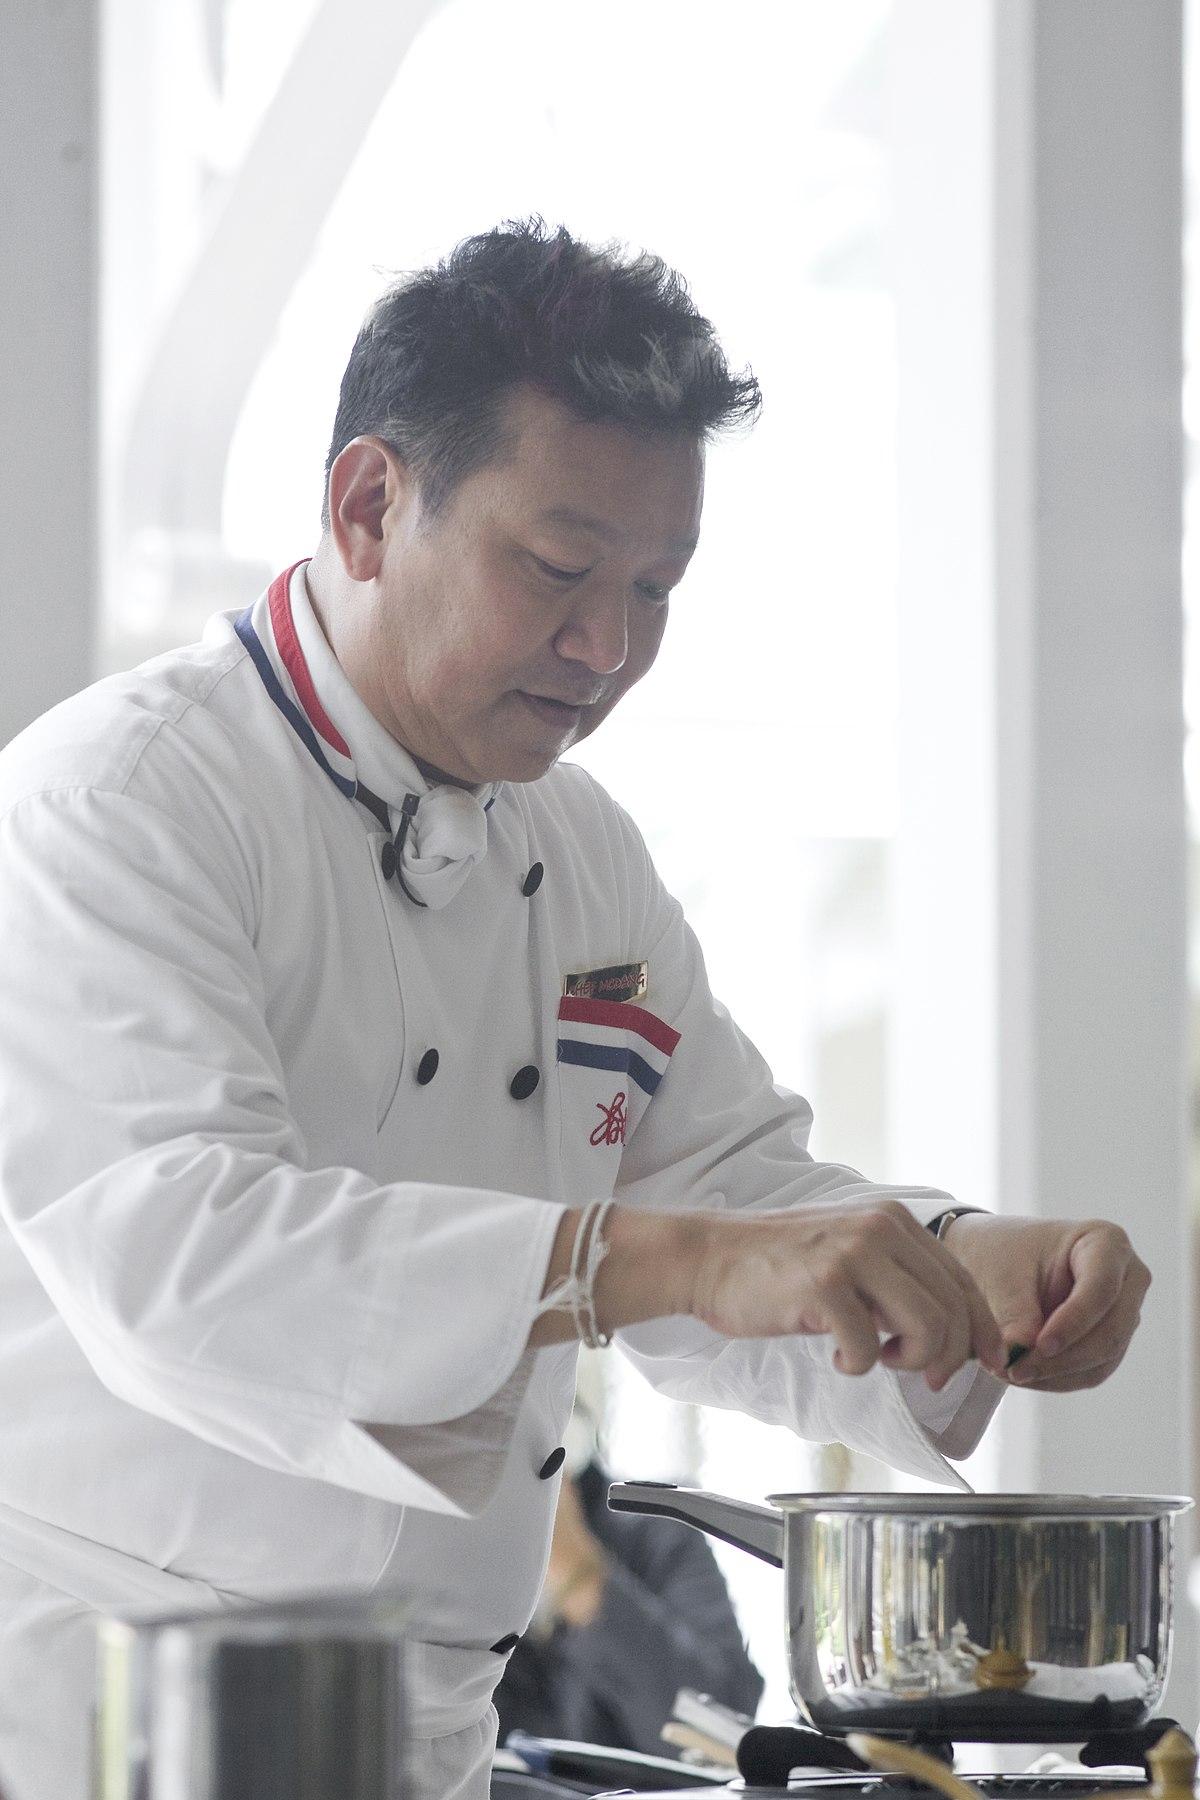 Culinary Institute Of America New York >> McDang - Wikipedia